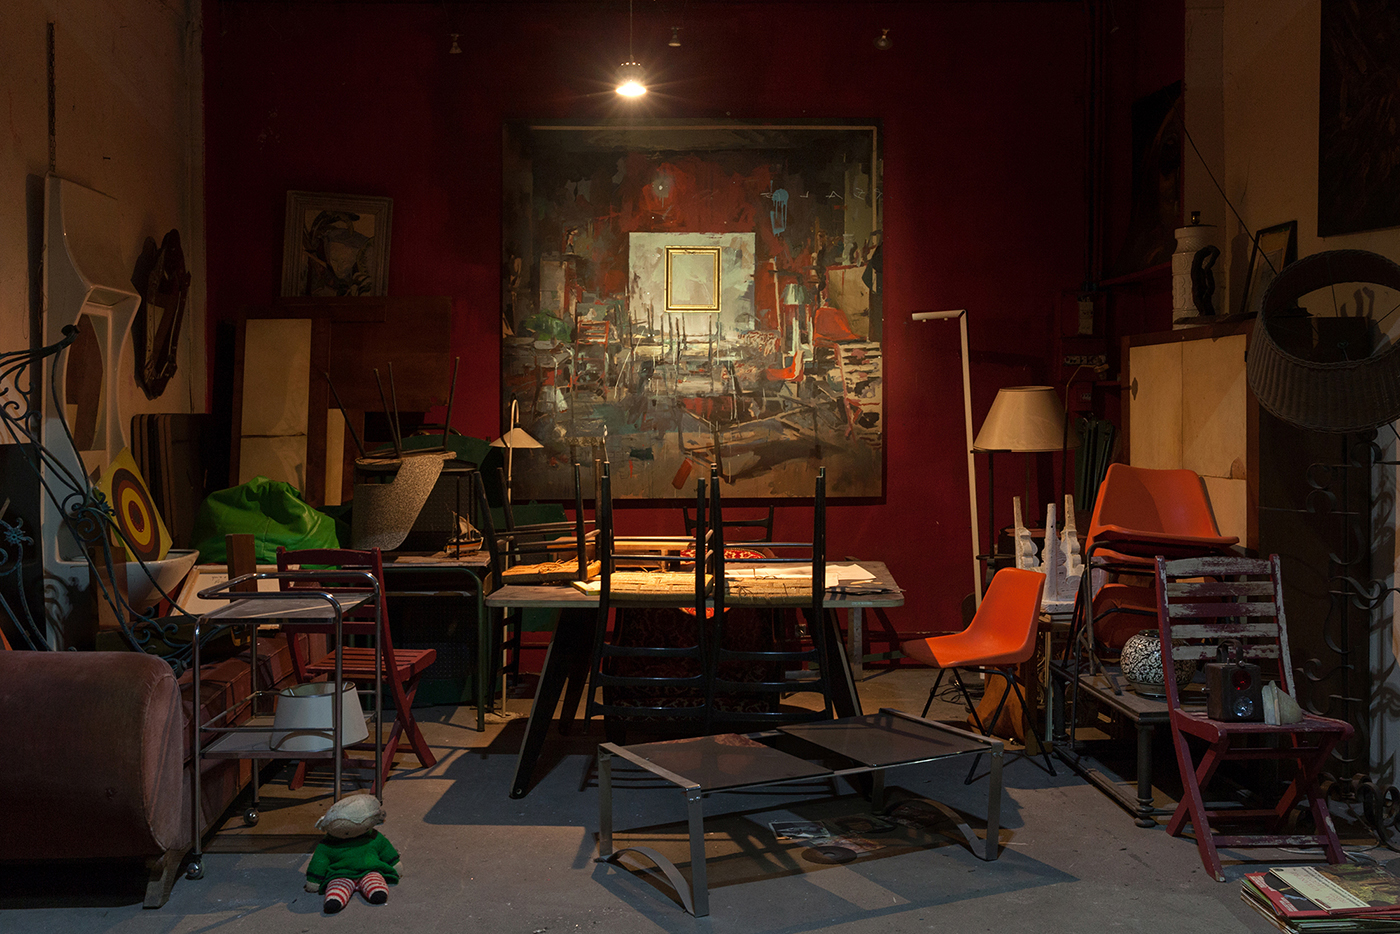 MATIÈRE NOIRE, exhibition by Gonzalo Borondo in Marseille, France Artes & contextos Matière Noire Borondo @ Blind Eye Factory 1